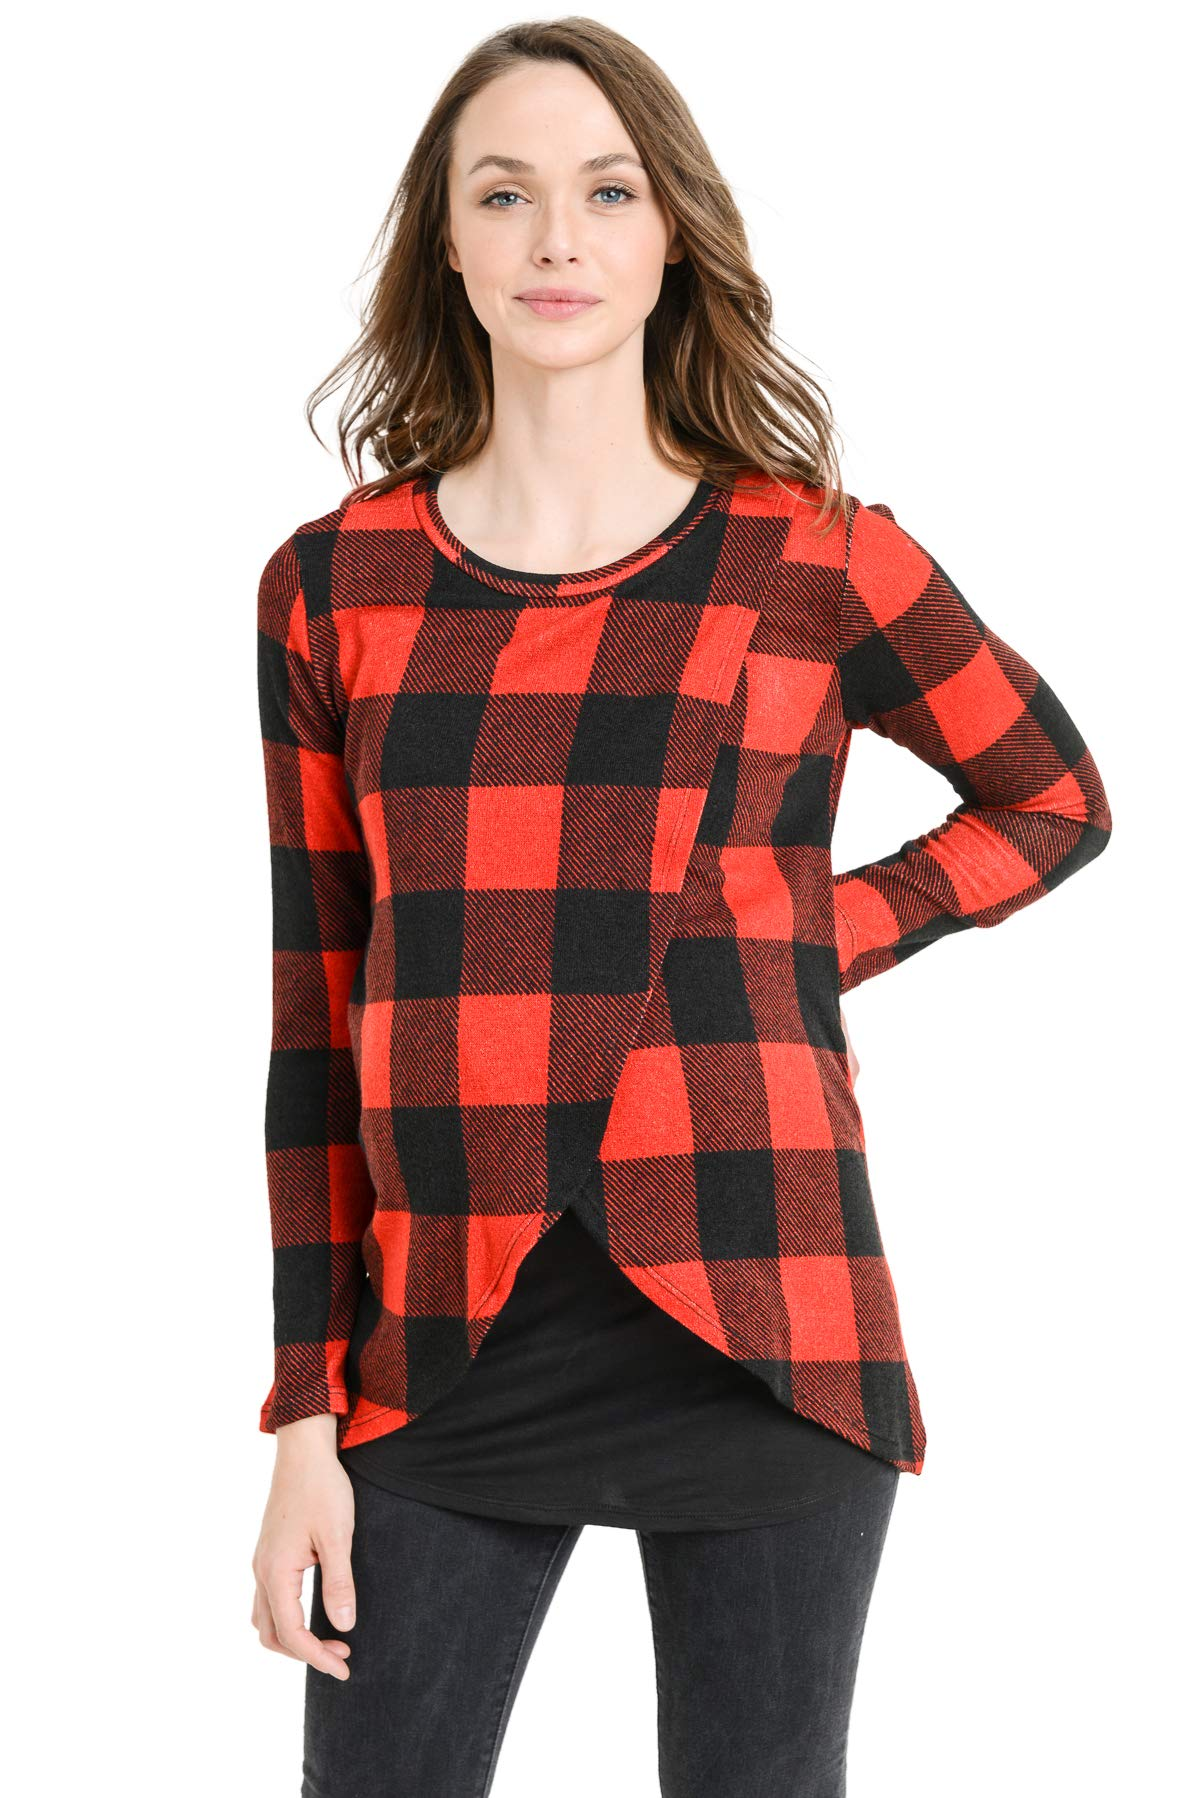 Hello MIZ Women's Maternity Sweater Knit Long Sleeve Overlay Breastfeeding Nursing Top (Red Plaid/Black, L)